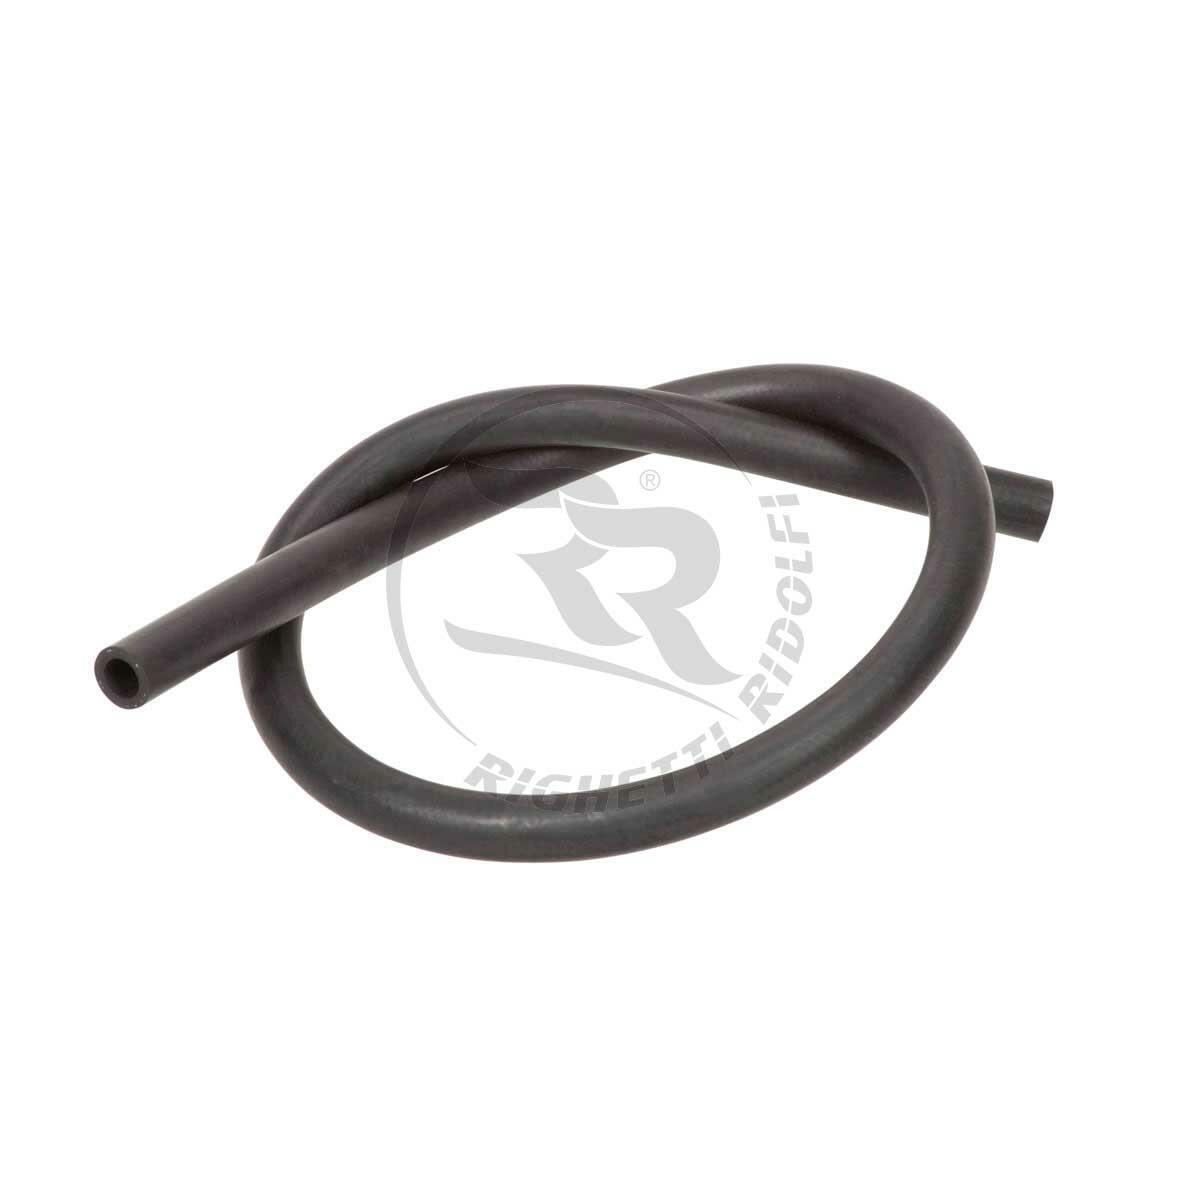 RUBBER PIPE - LENGTH 1200mm - BLACK COLOUR